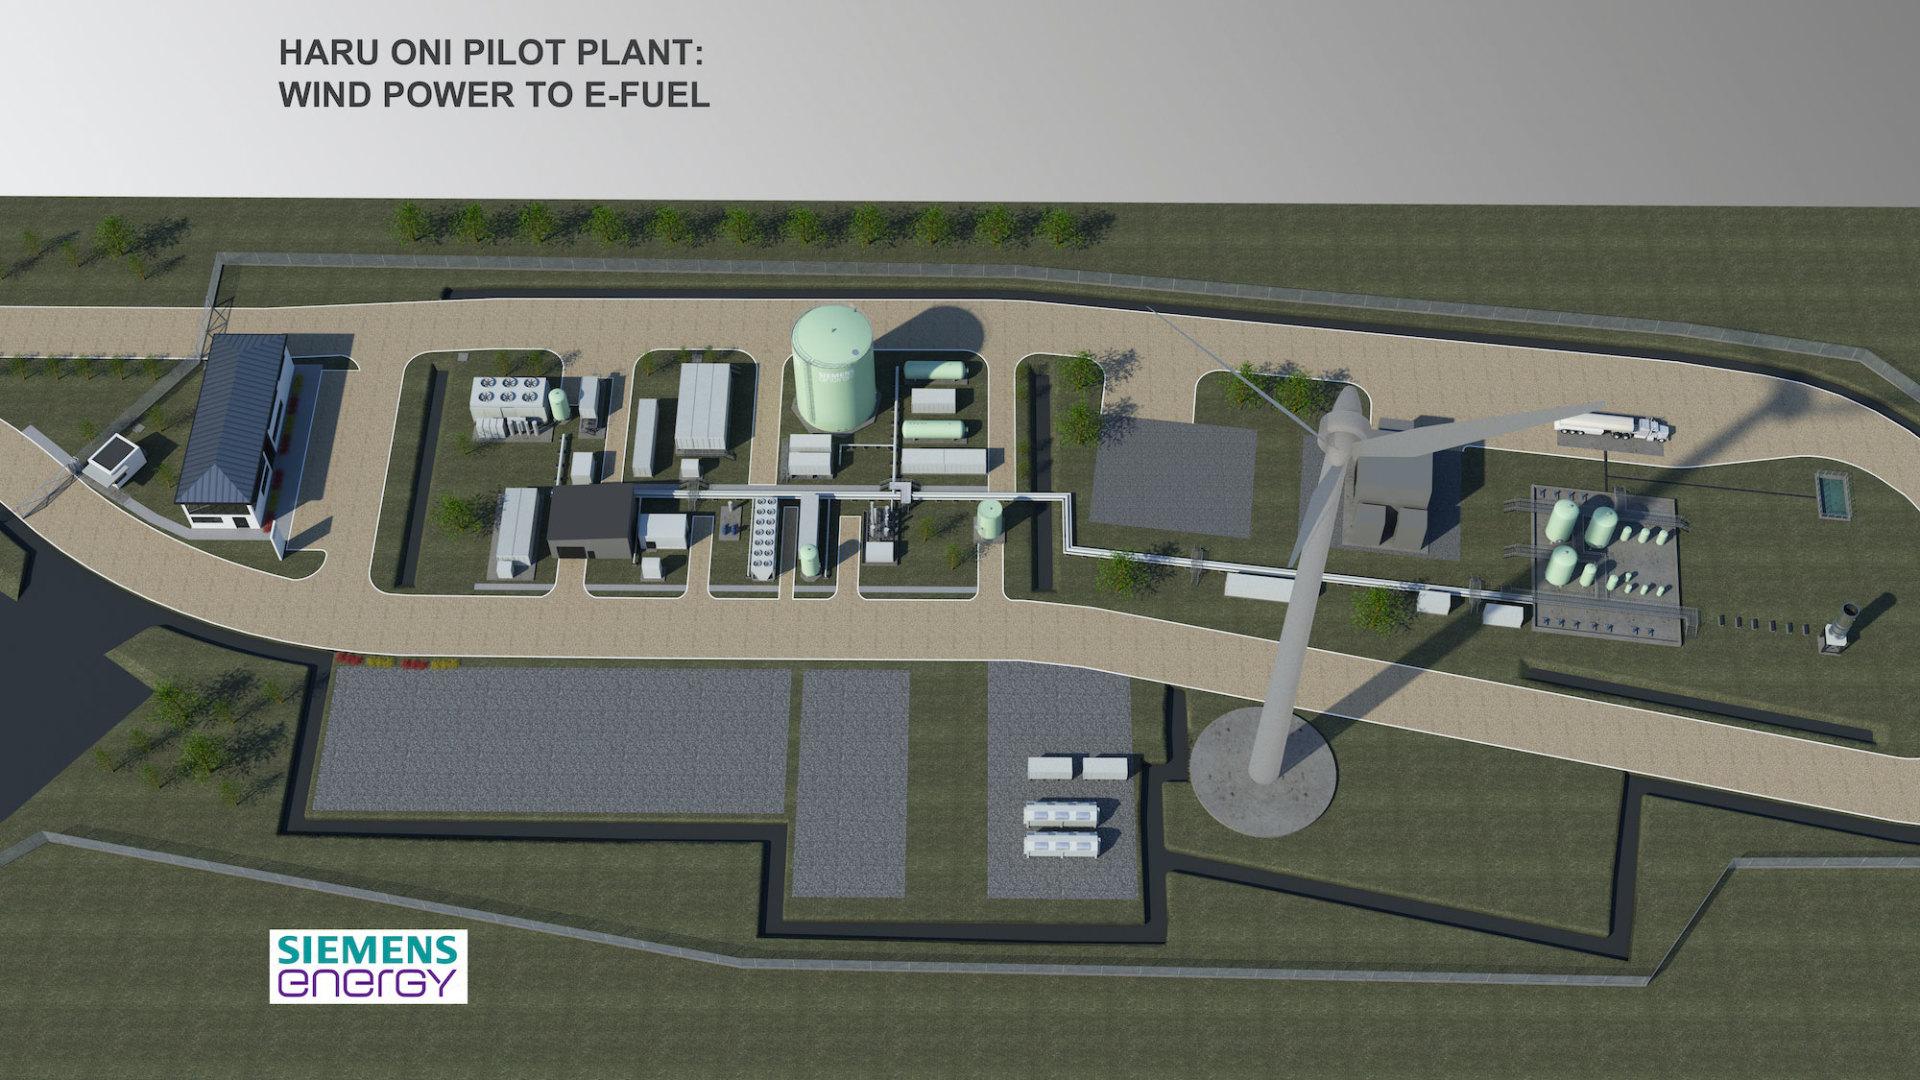 Fabrica Combustible Sintetico Porsche Siemens Haru Oni